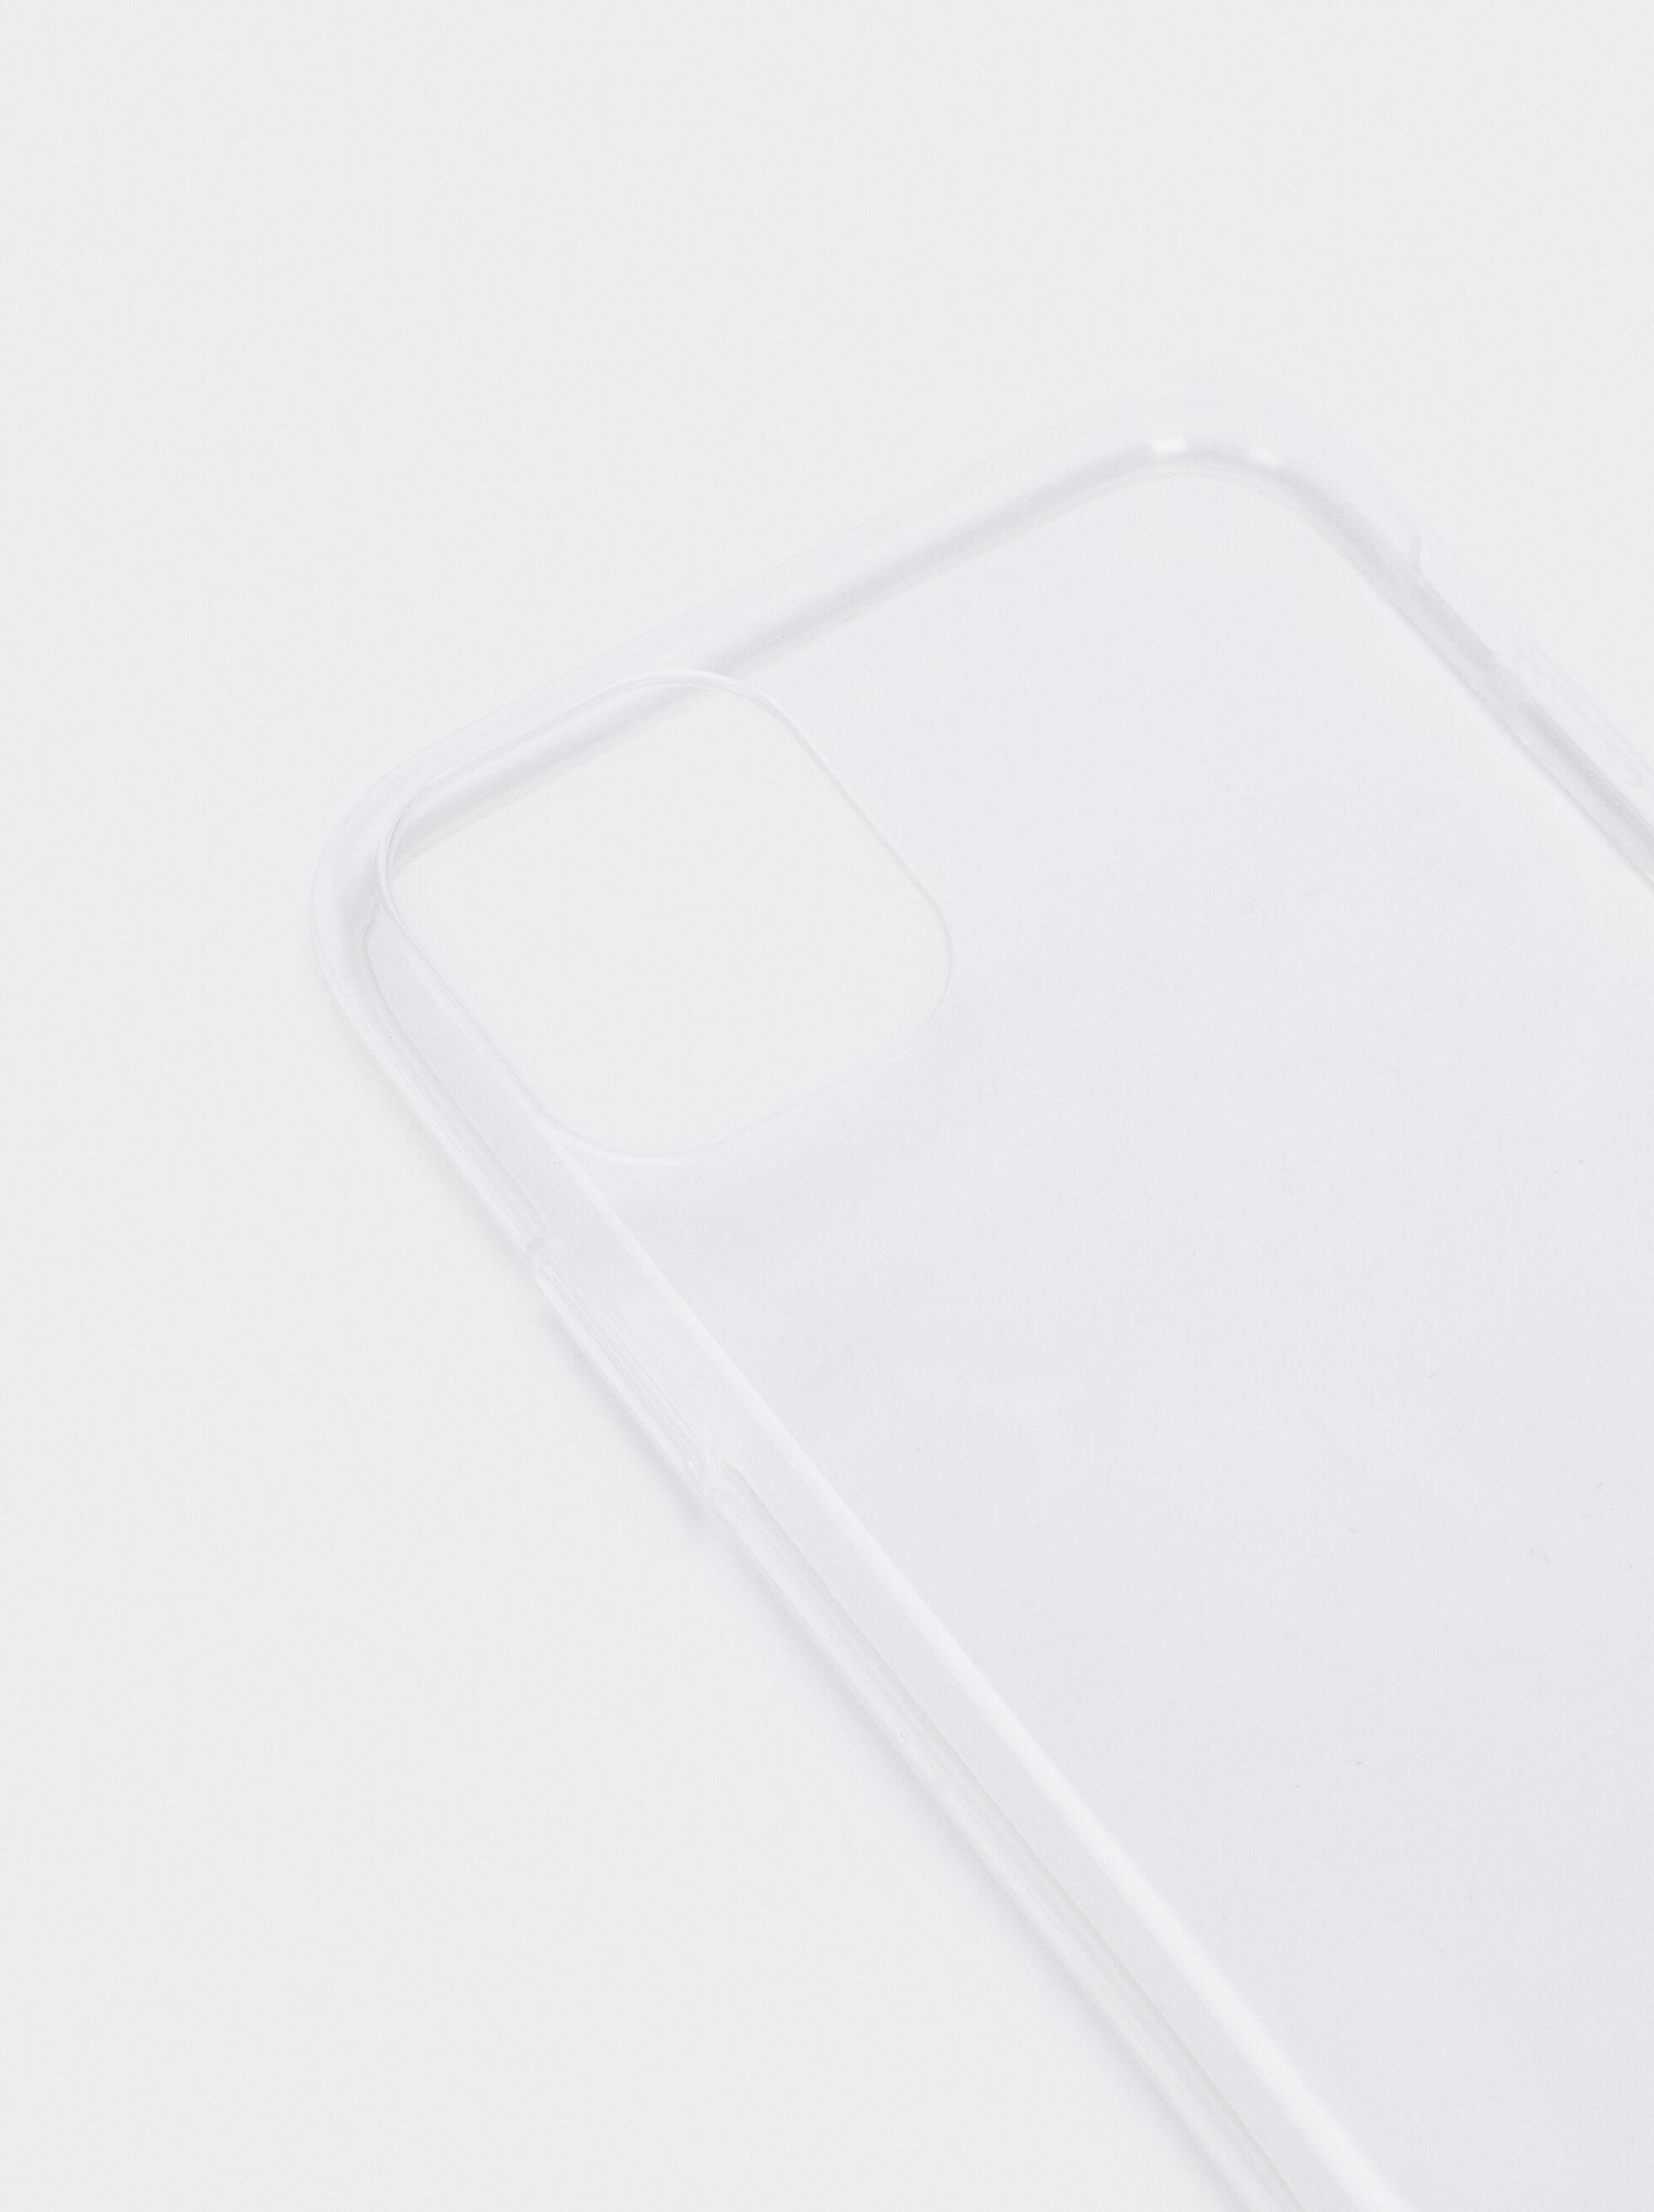 Iphone 11 Phone Case, Grey, hi-res